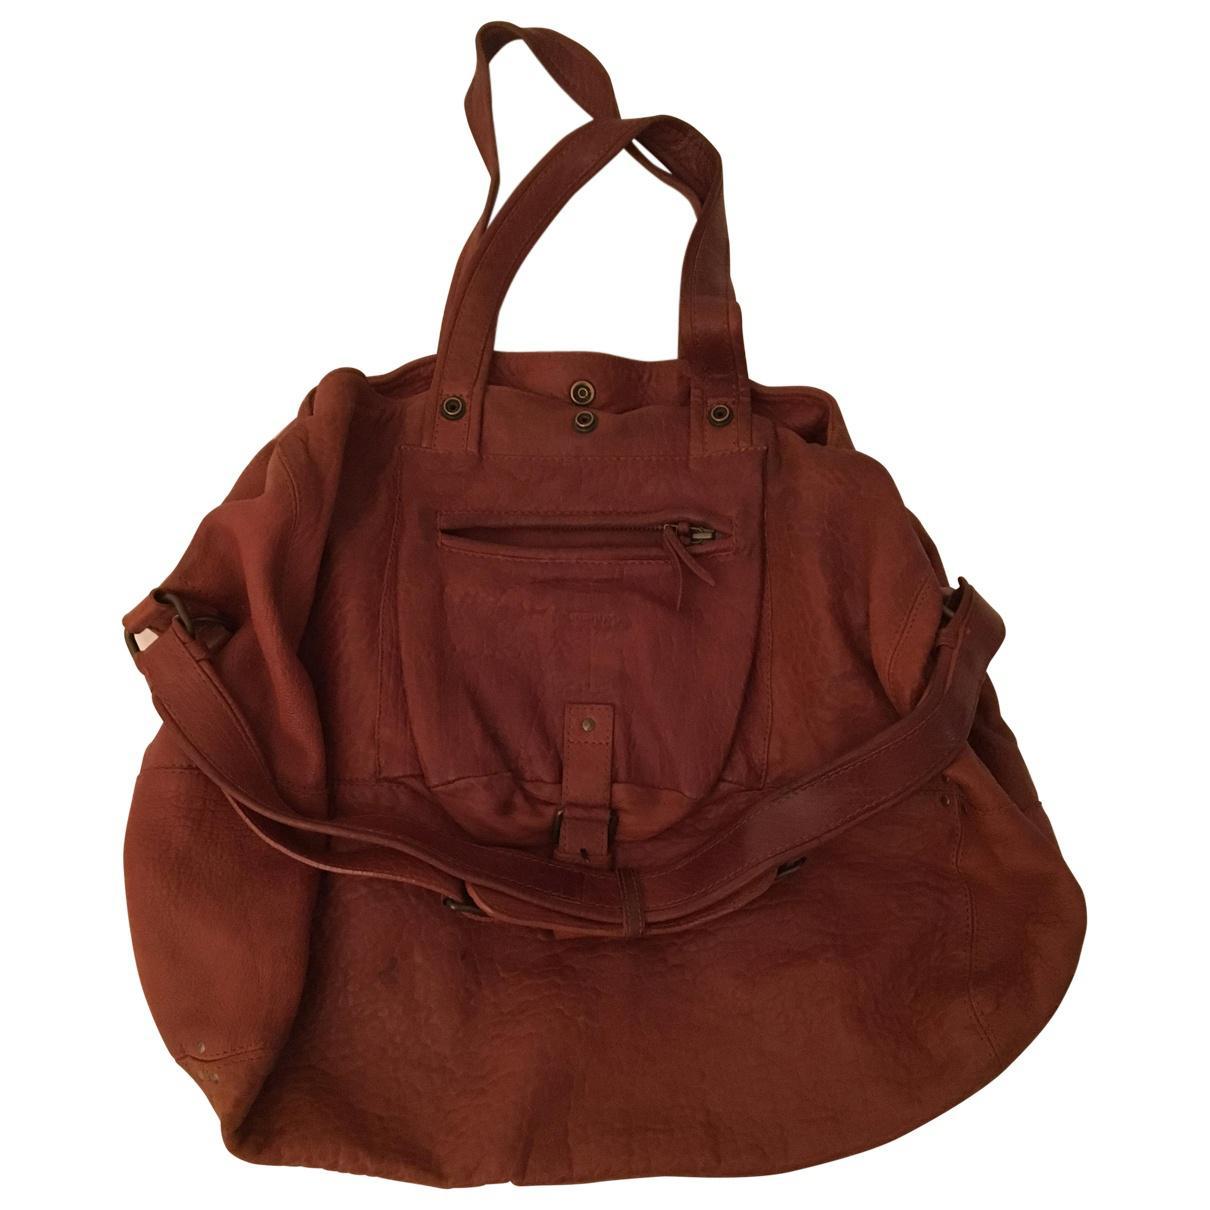 Pre-owned - Leather handbag Jerome Dreyfuss jvMsa1x6Cz